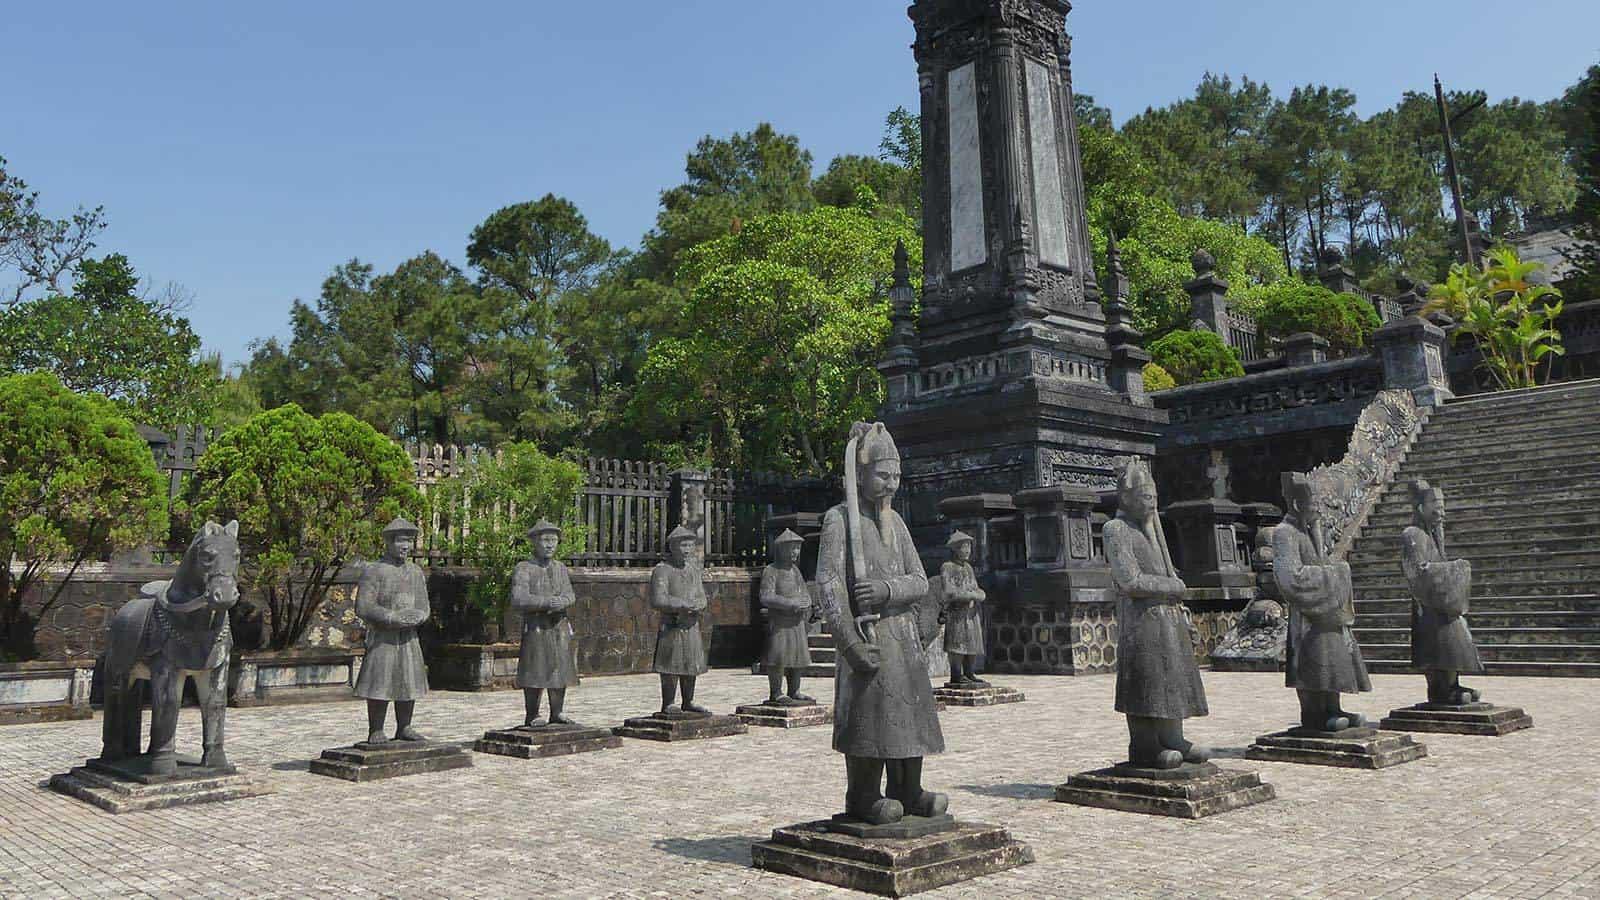 Best time to visit Khai Dinh tomb